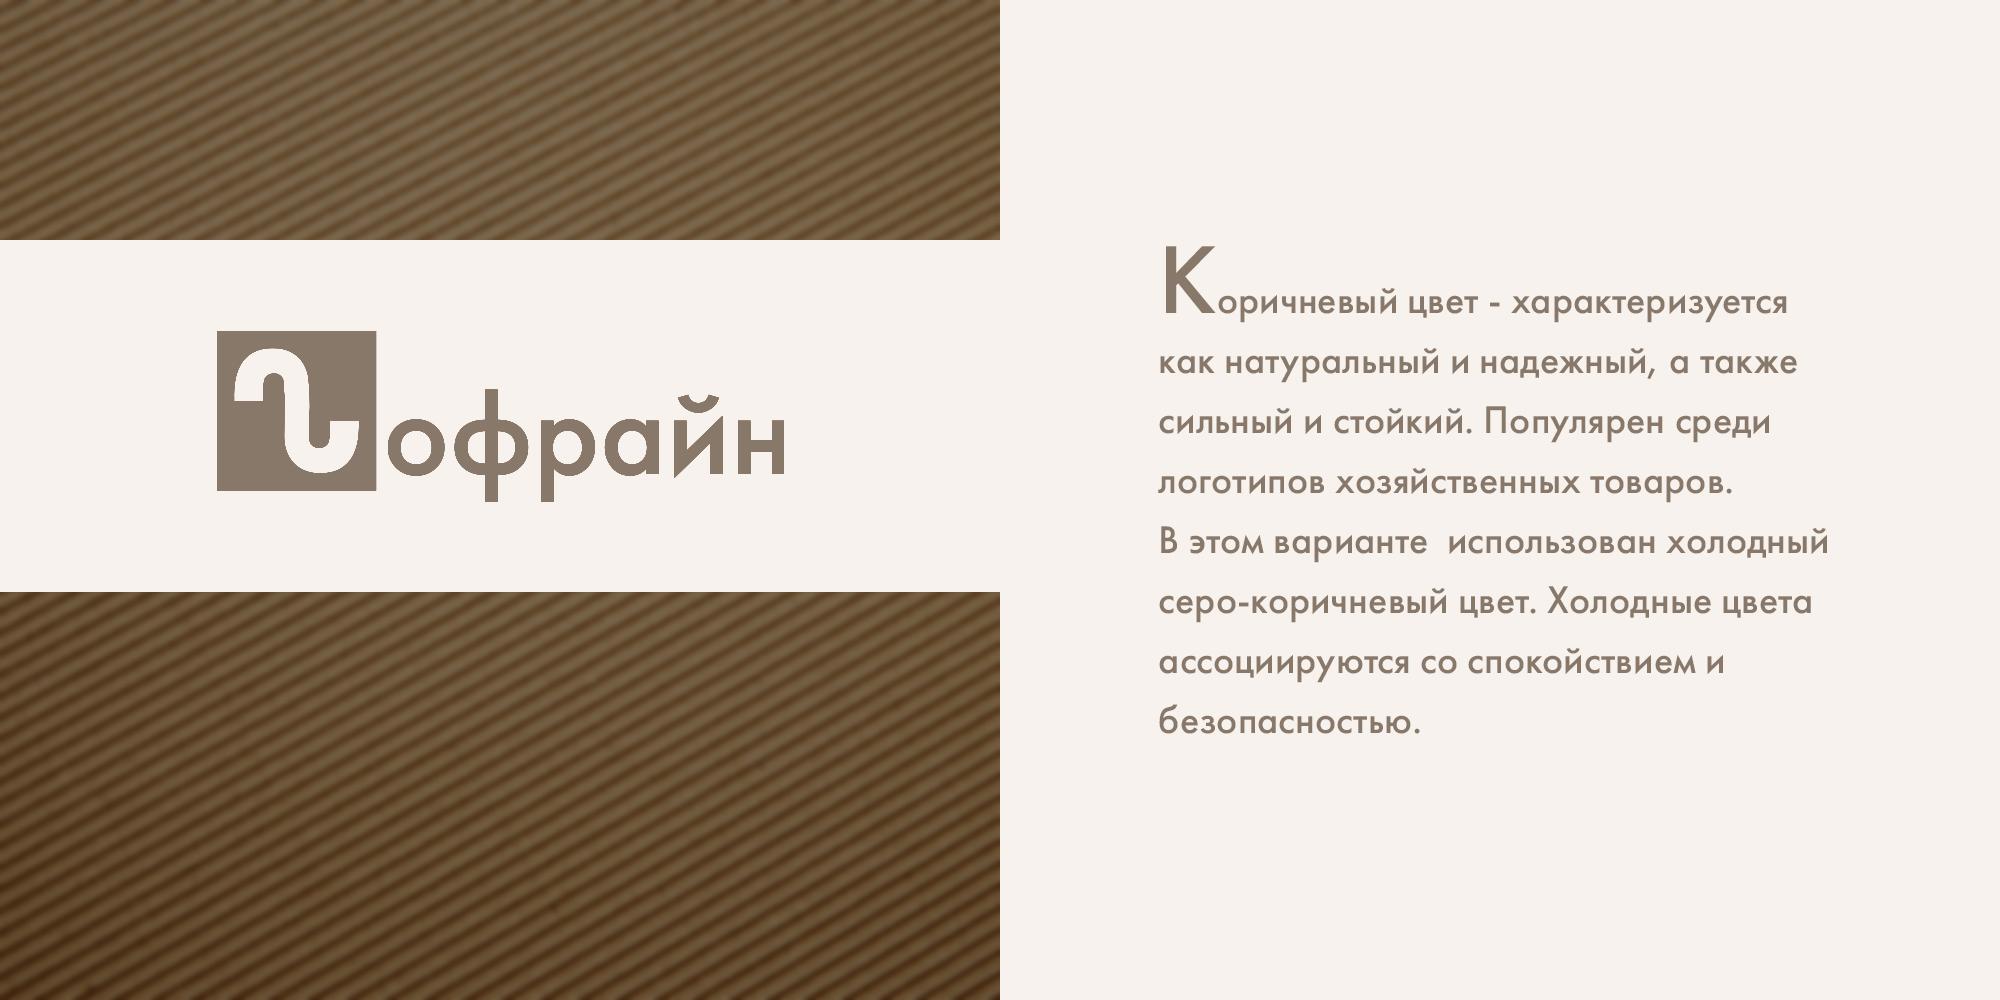 Логотип для компании по реализации упаковки из гофрокартона фото f_1605ce2435a31cea.jpg